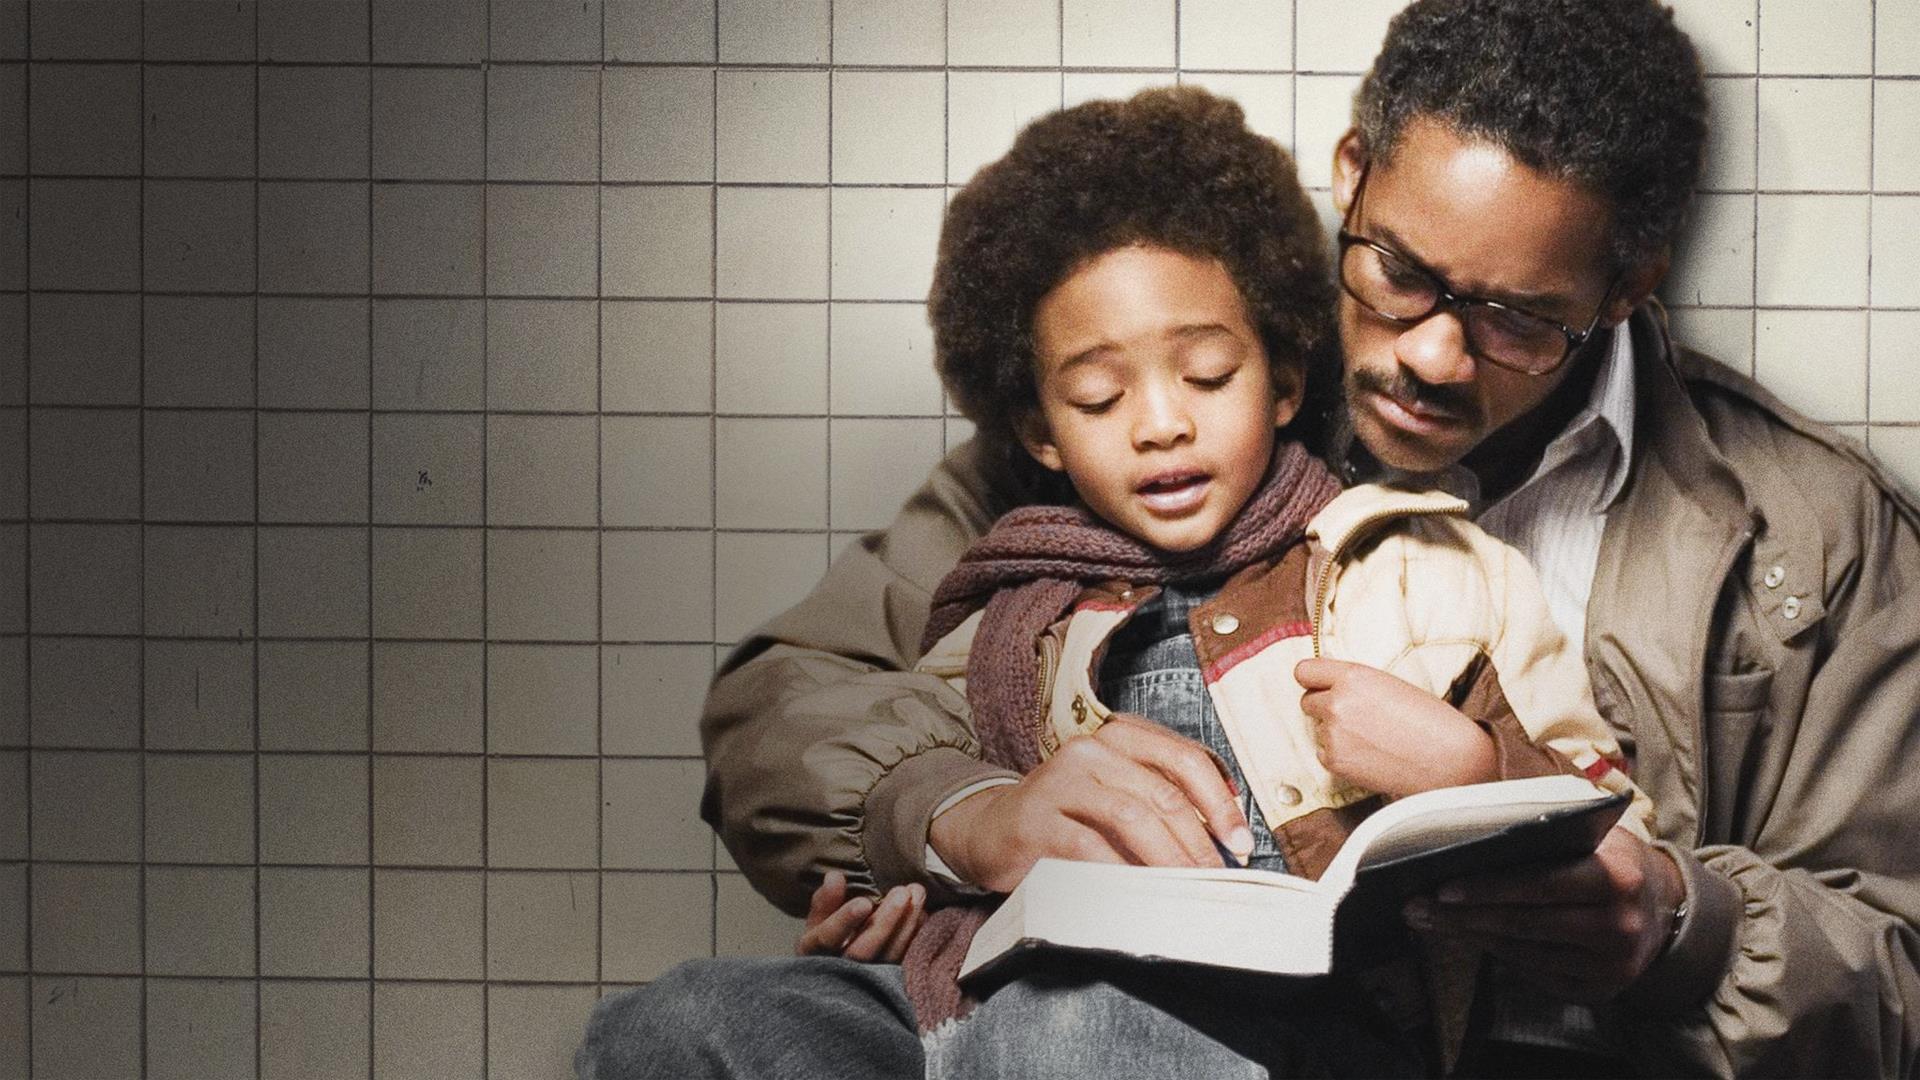 Umudunu Kaybetme - en iyi 5 sinema filmi